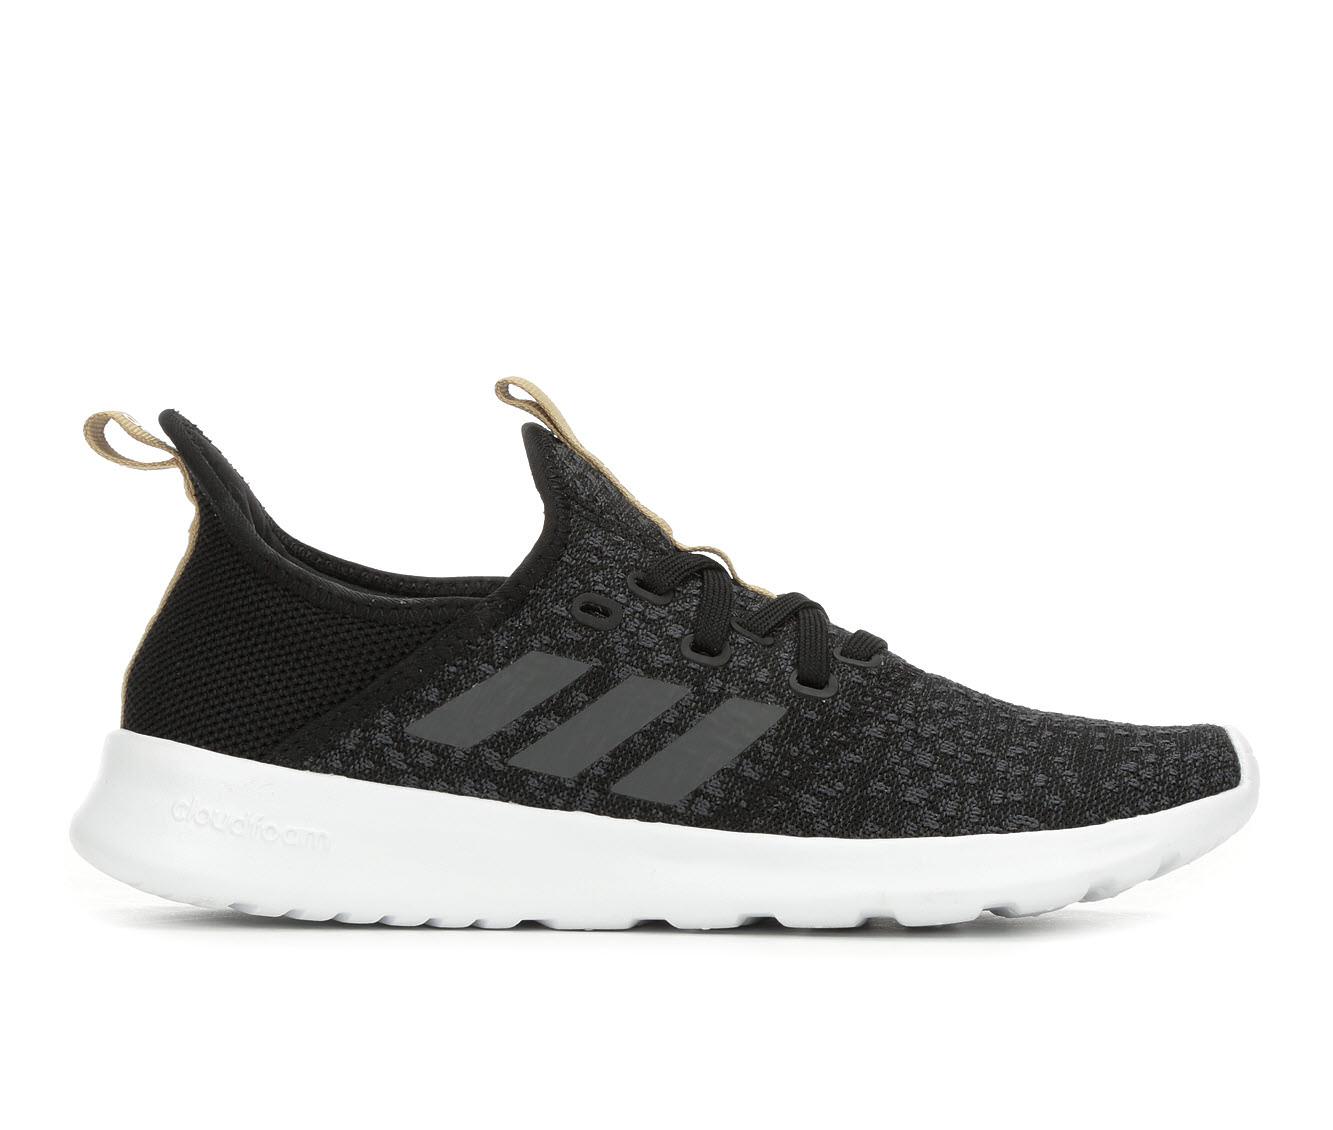 Adidas Pure Women's Athletic Shoe (Black)